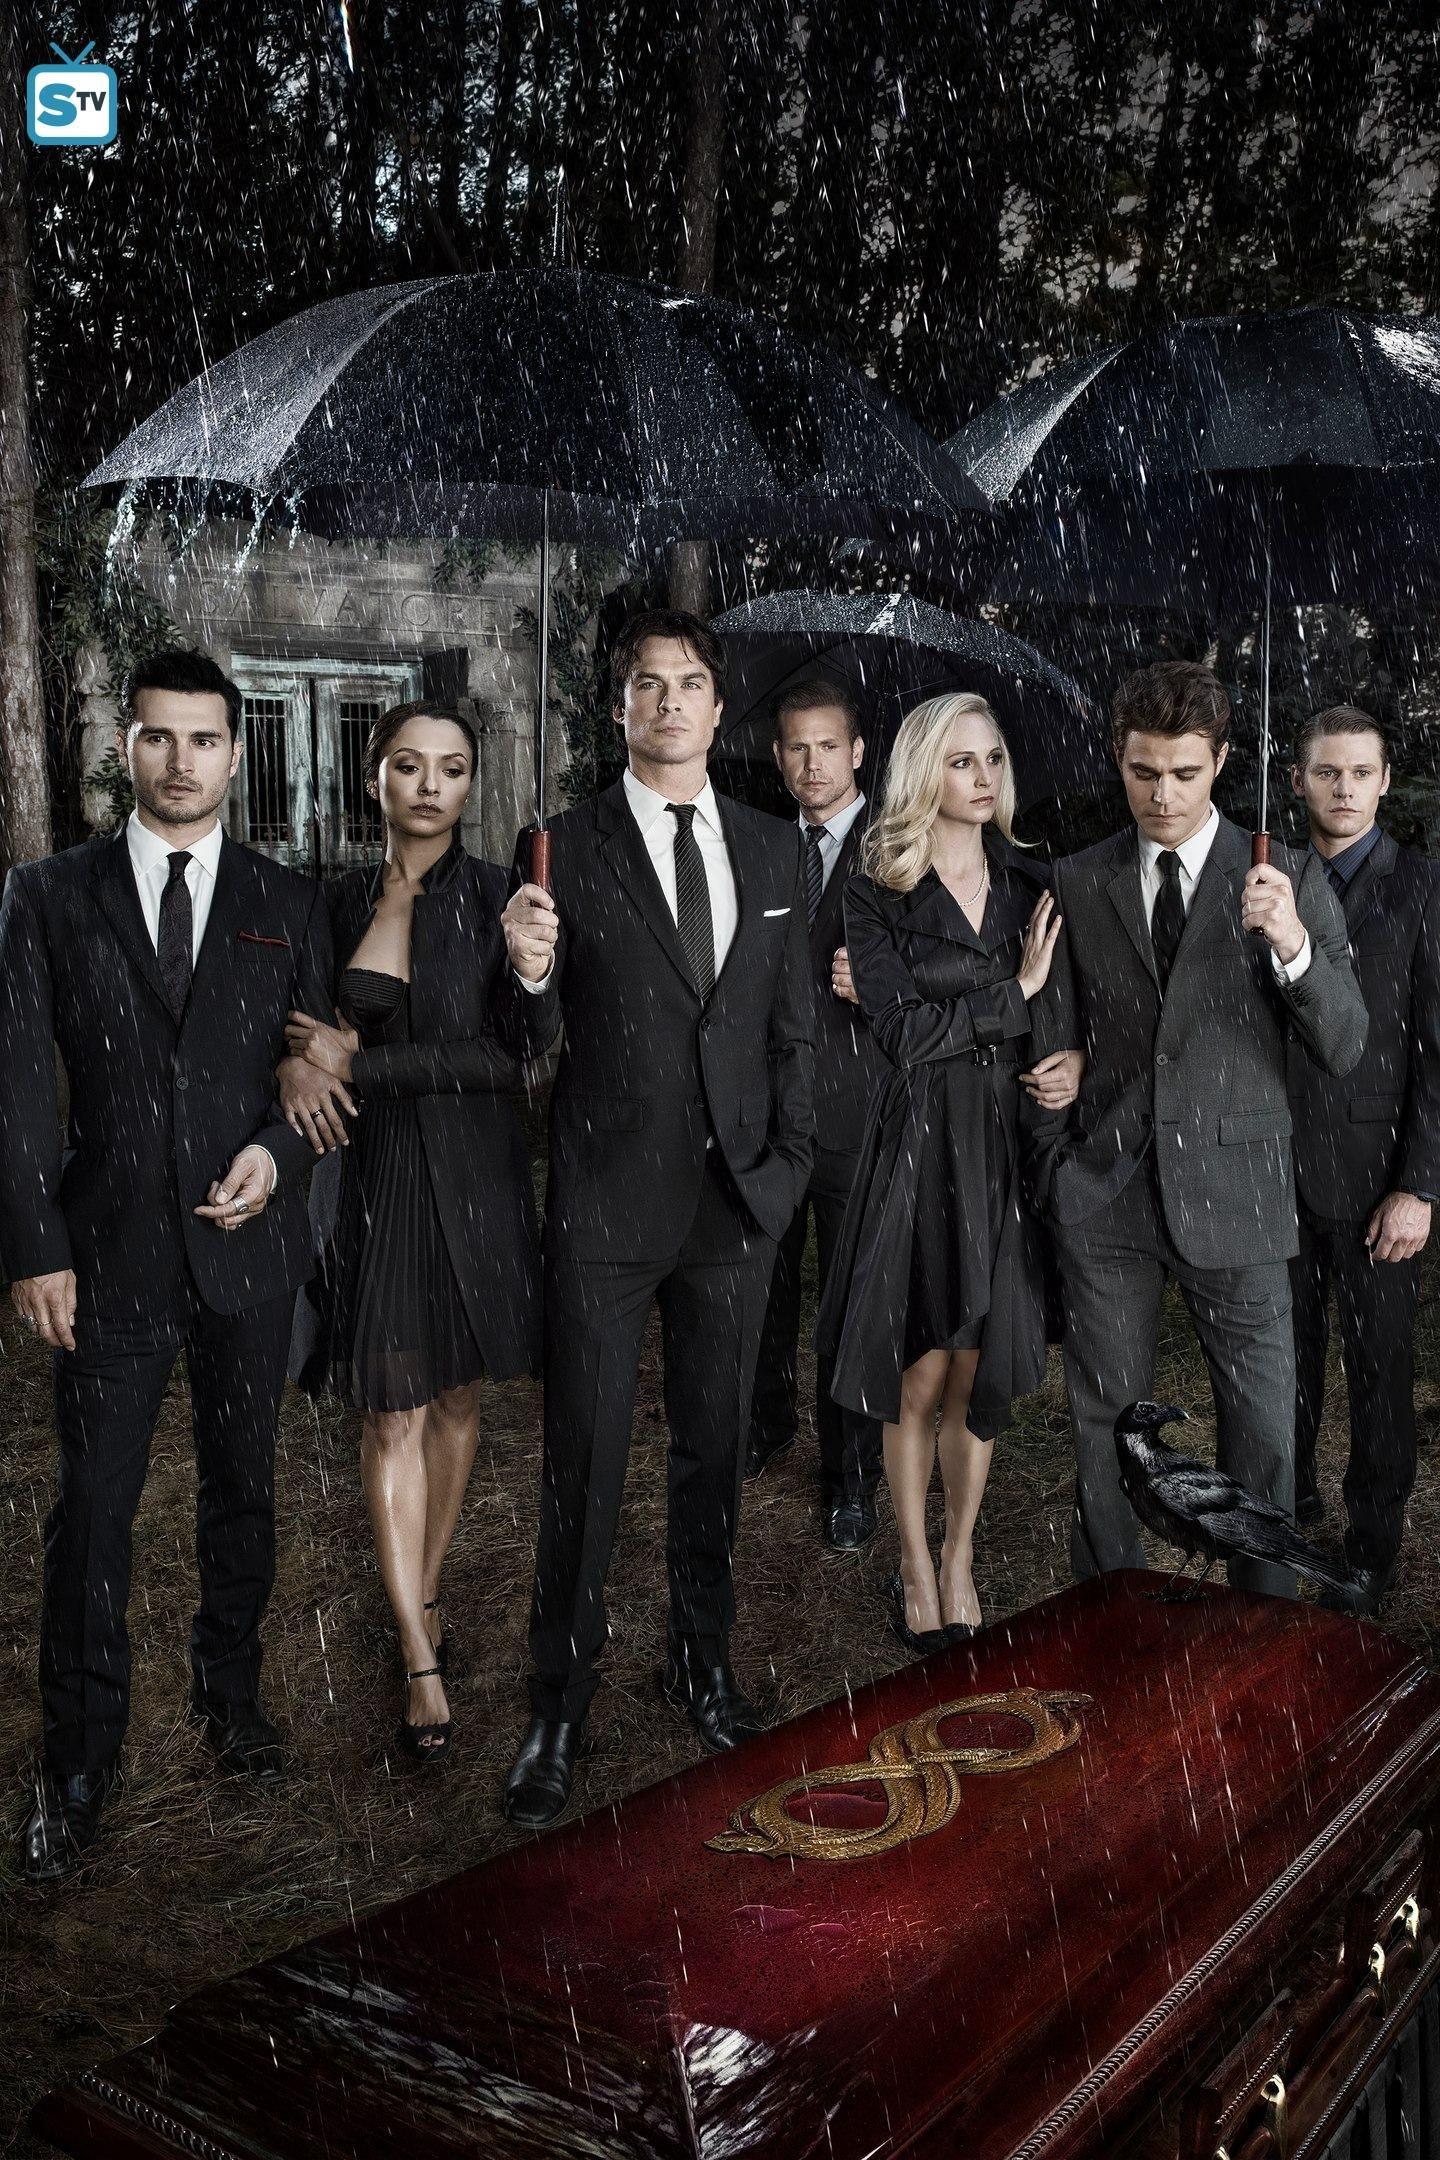 Vampire Diaries Wallpaper Damon And Elena 75 Pictures